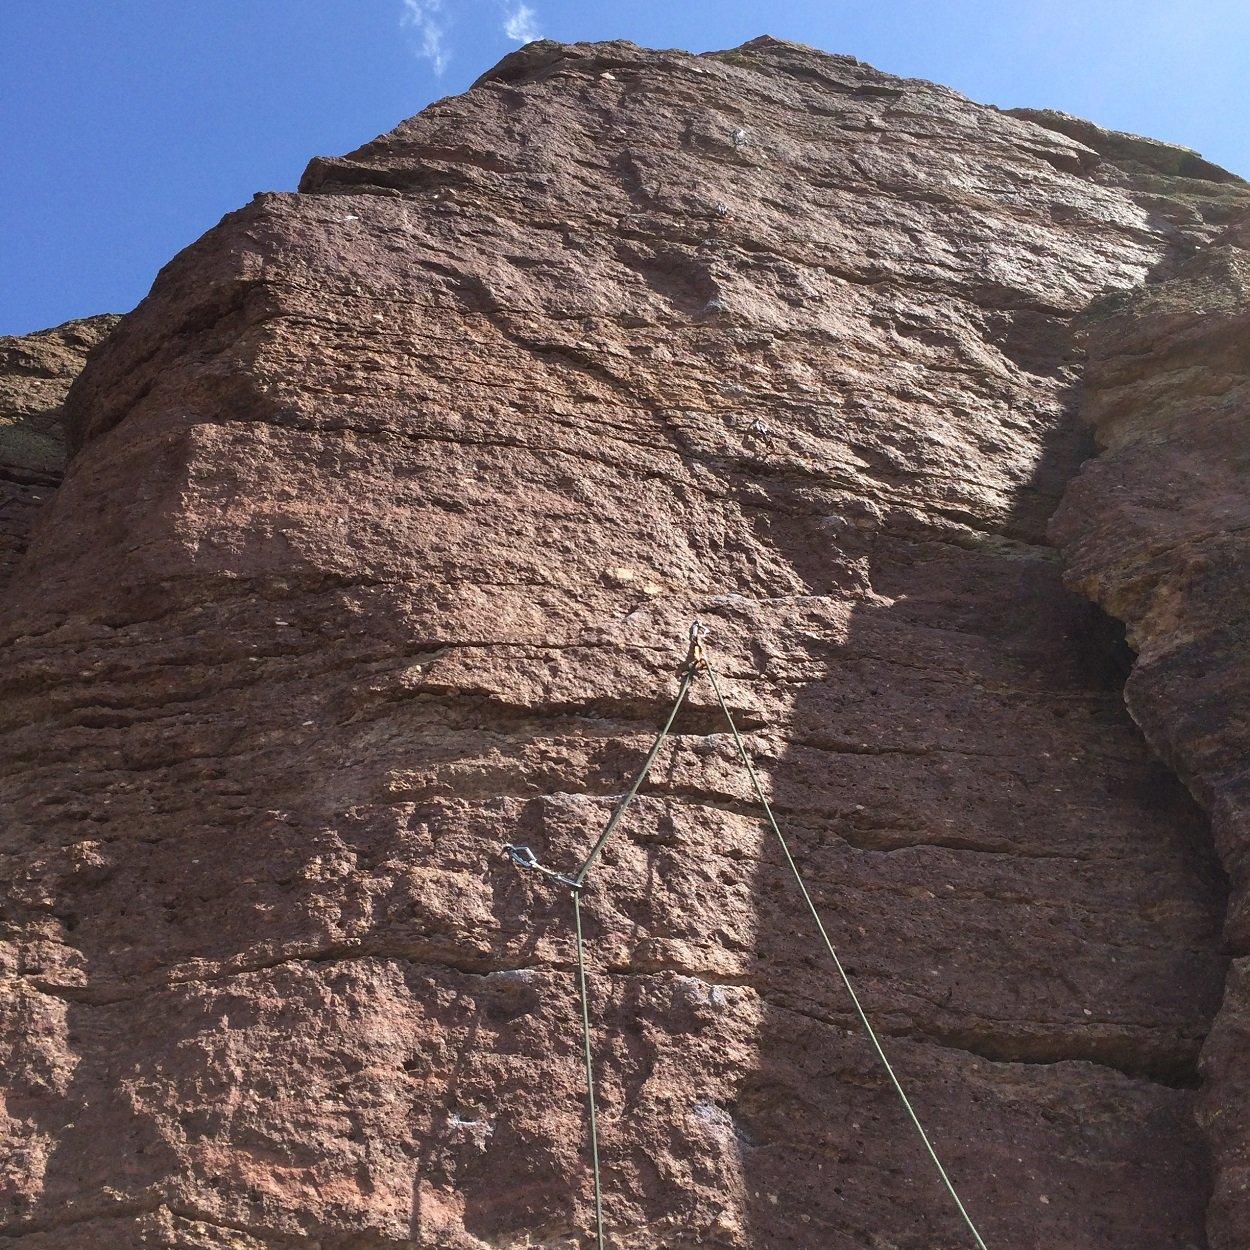 Aggro Bumbly - Pleasure Palace - Smith Rock Climbing